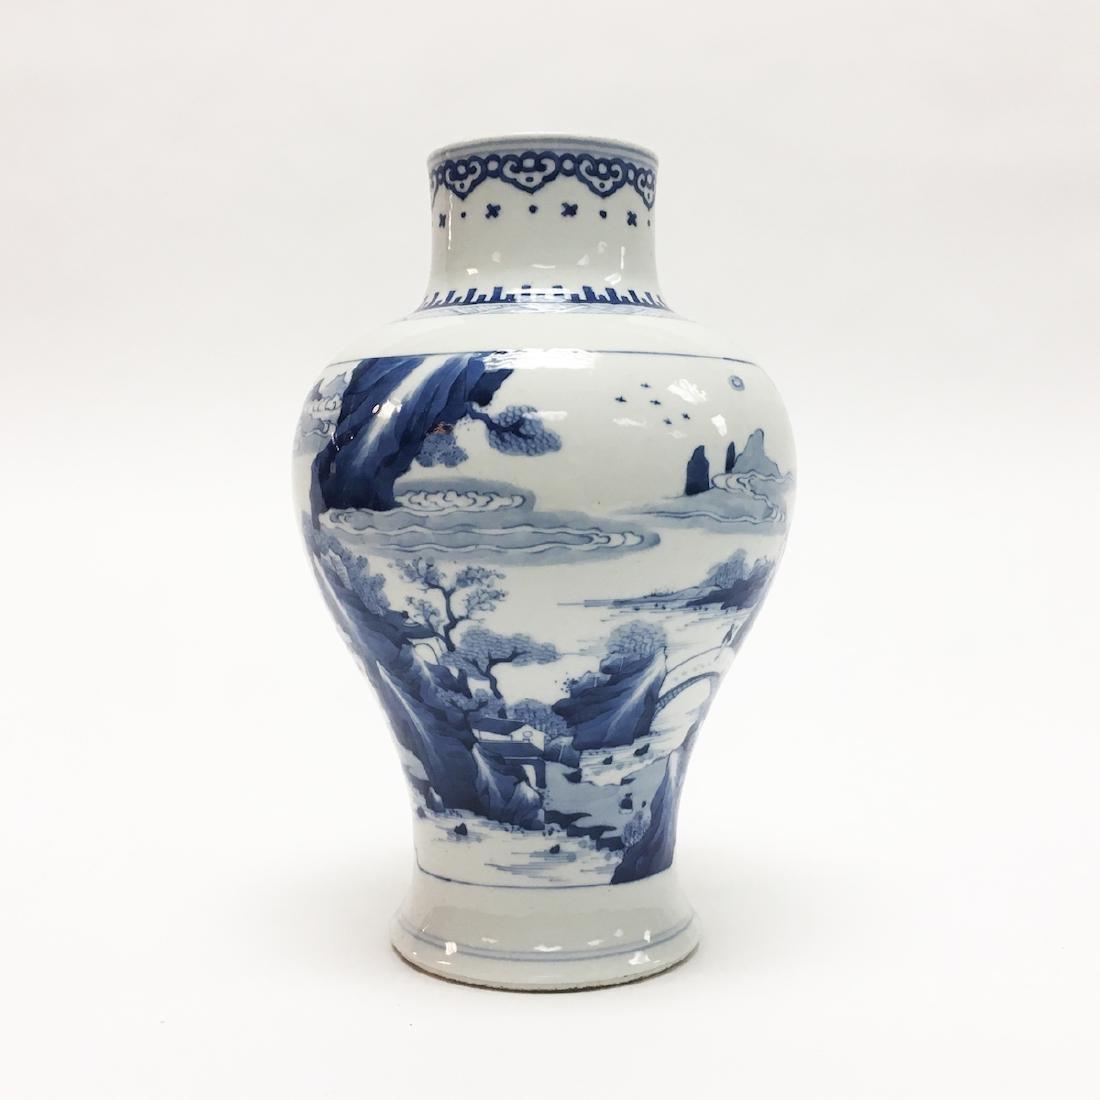 Chinese Porcelain Blue and White Vase - 2